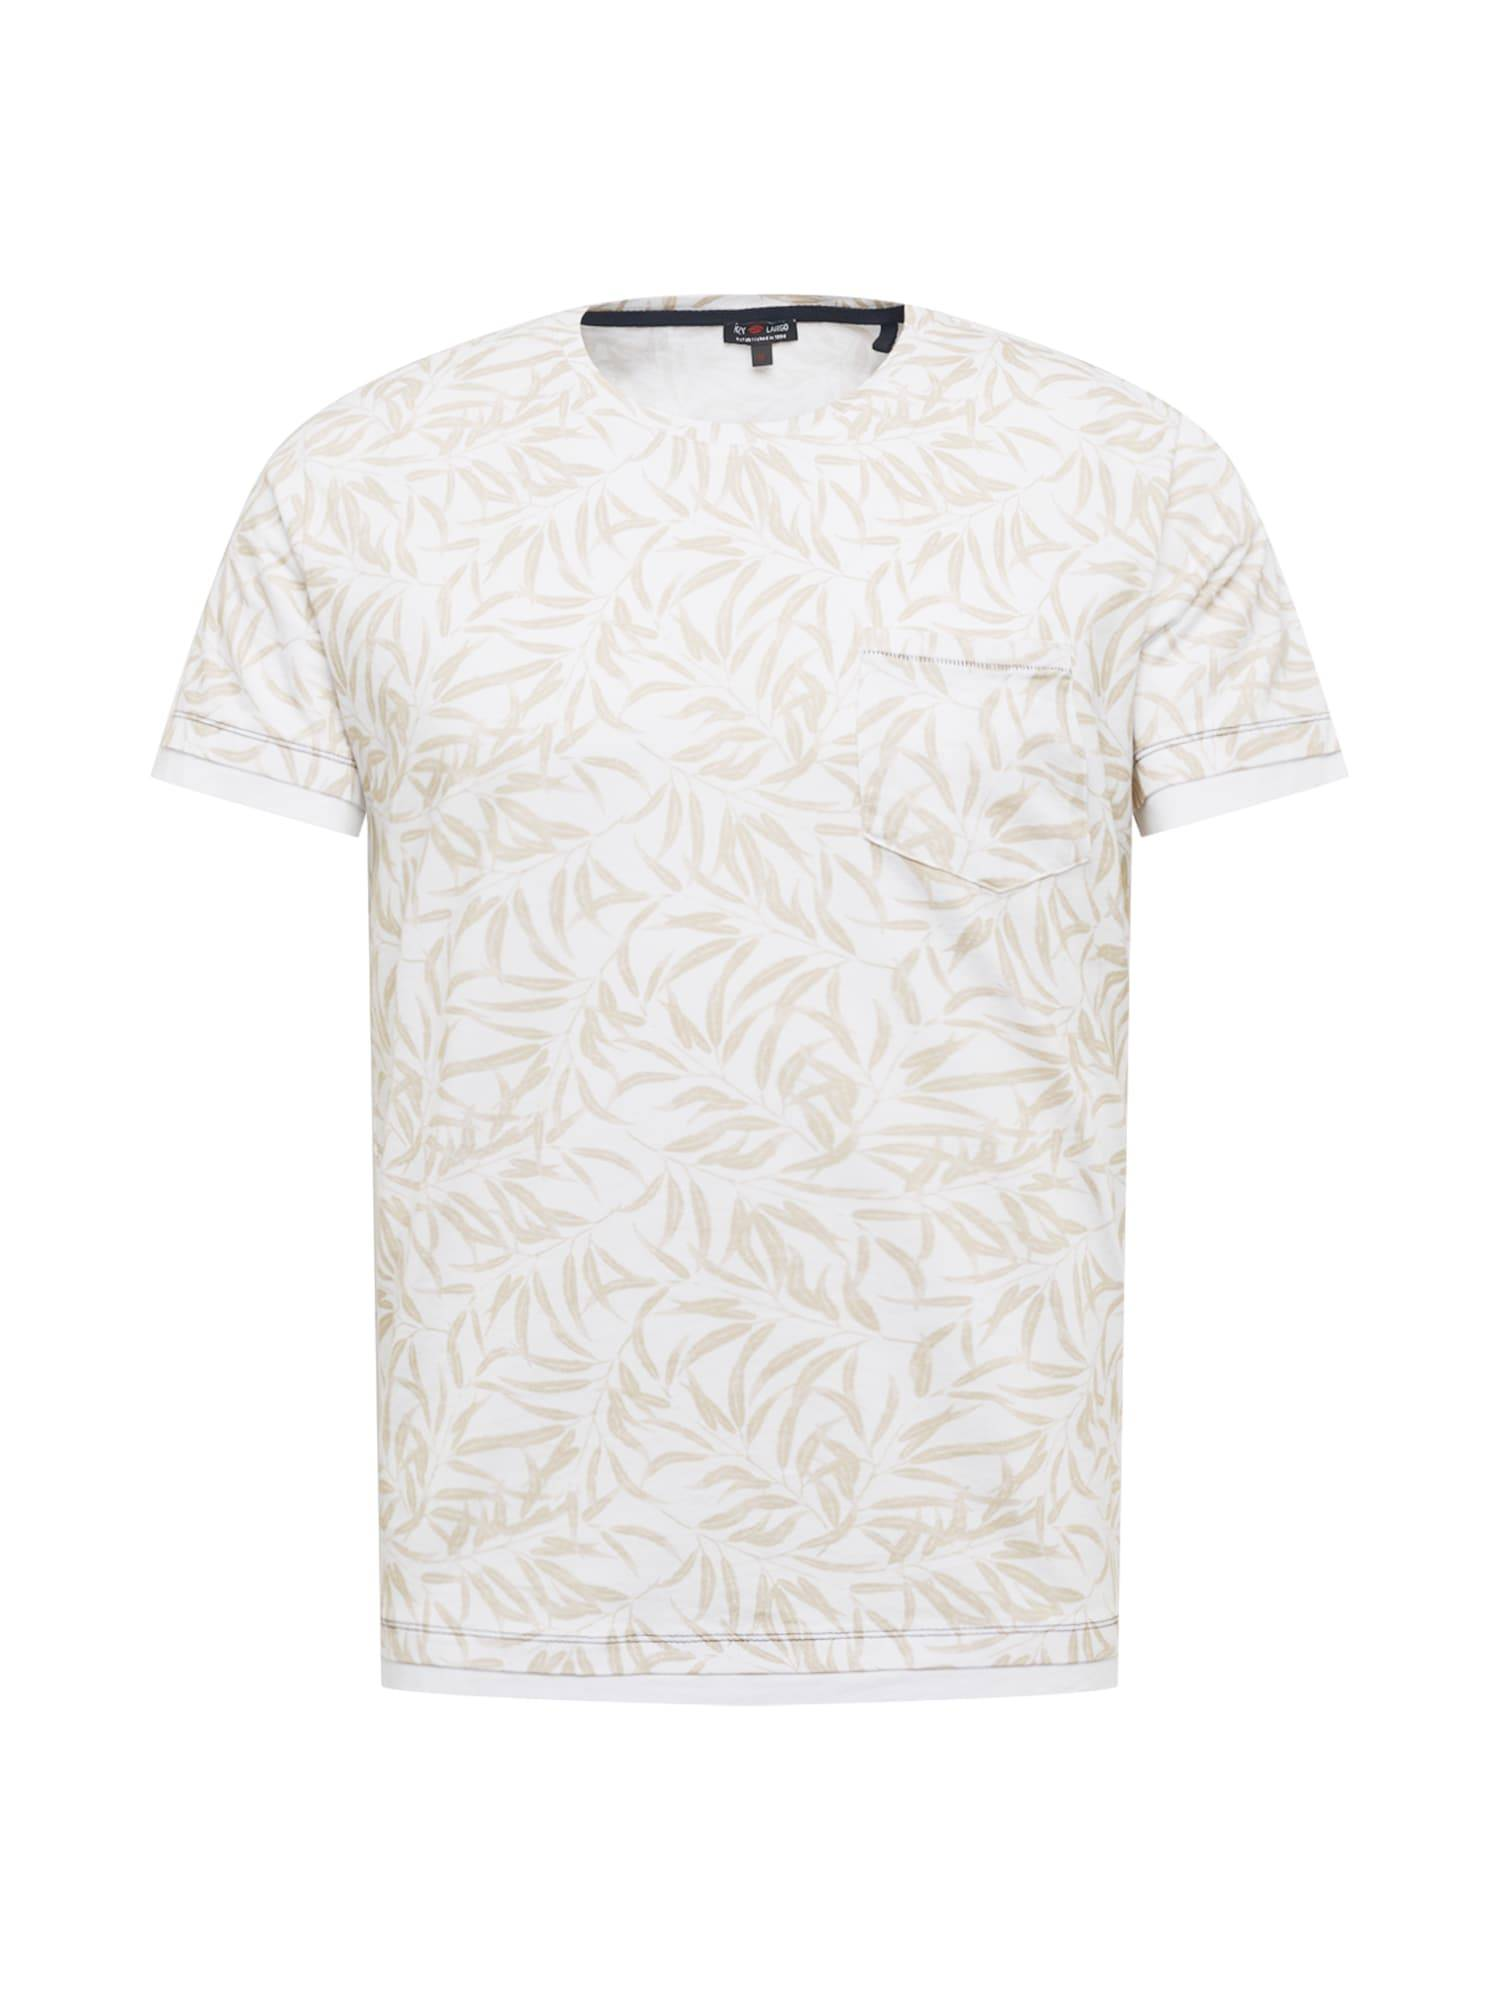 Key Largo T-Shirt 'LOCATION'  - Blanc - Taille: M - male